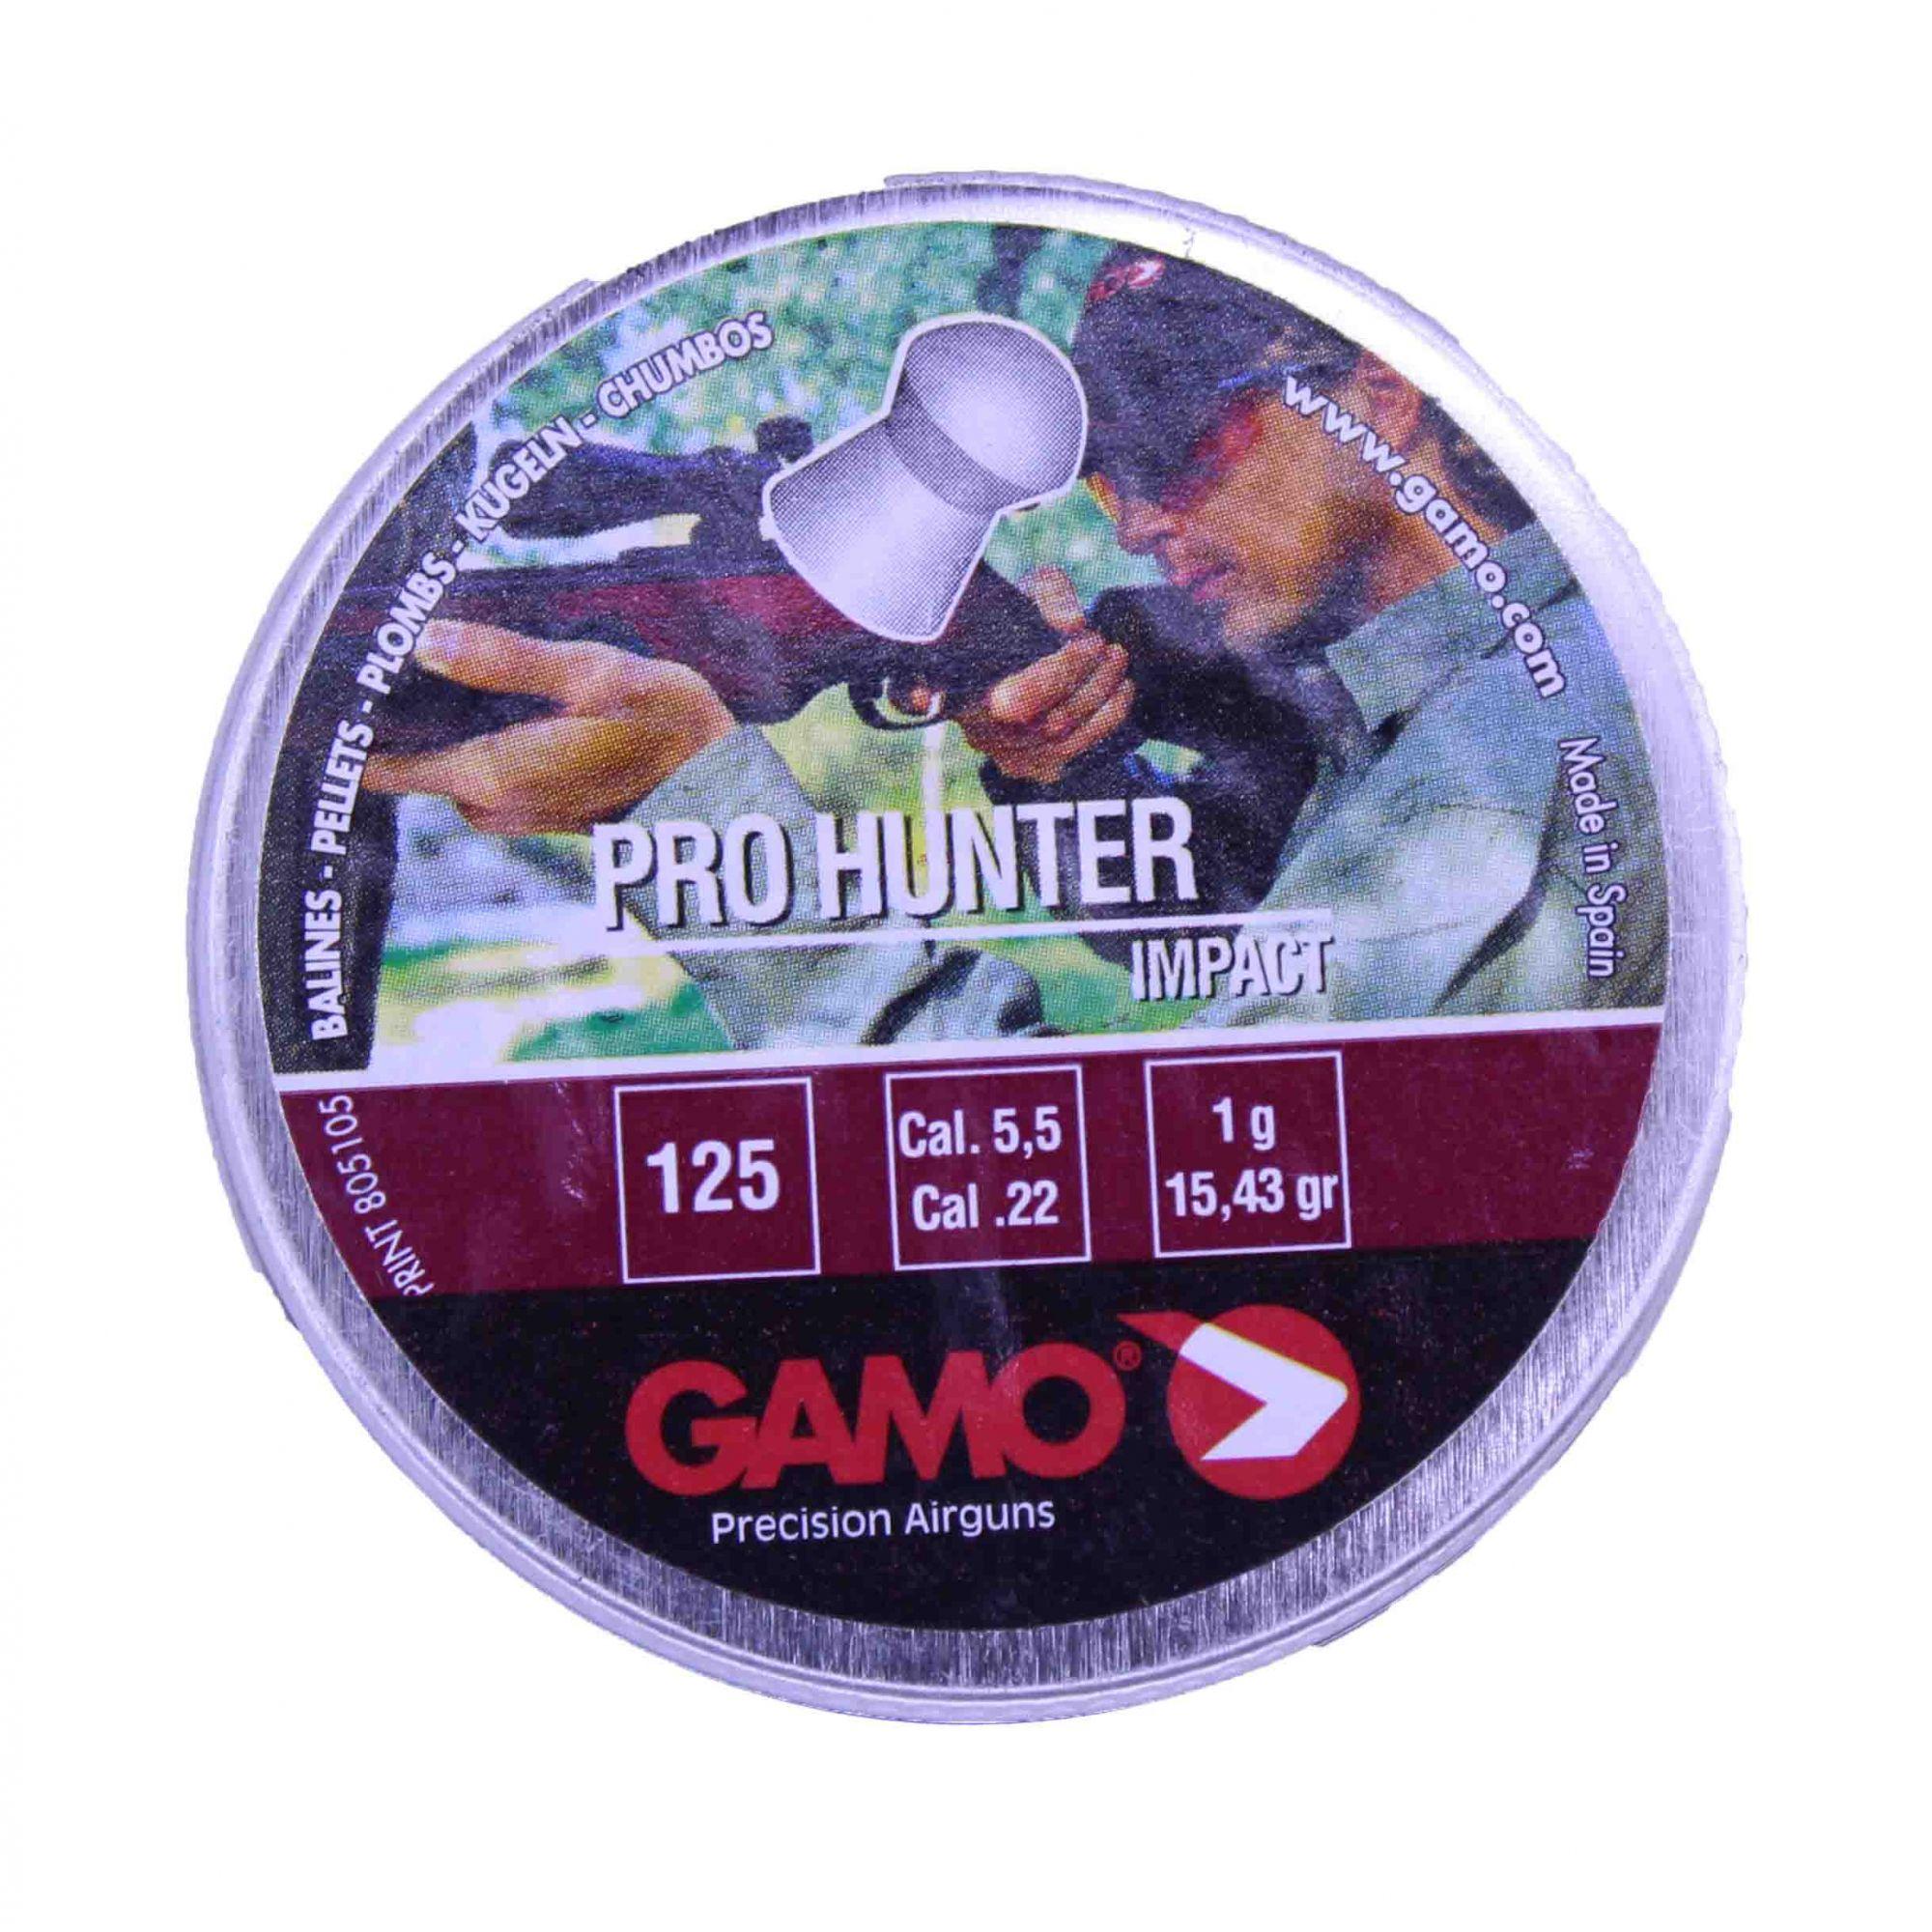 Chumbinho Gamo Pro Hunter Impact .22 - 5.5mm